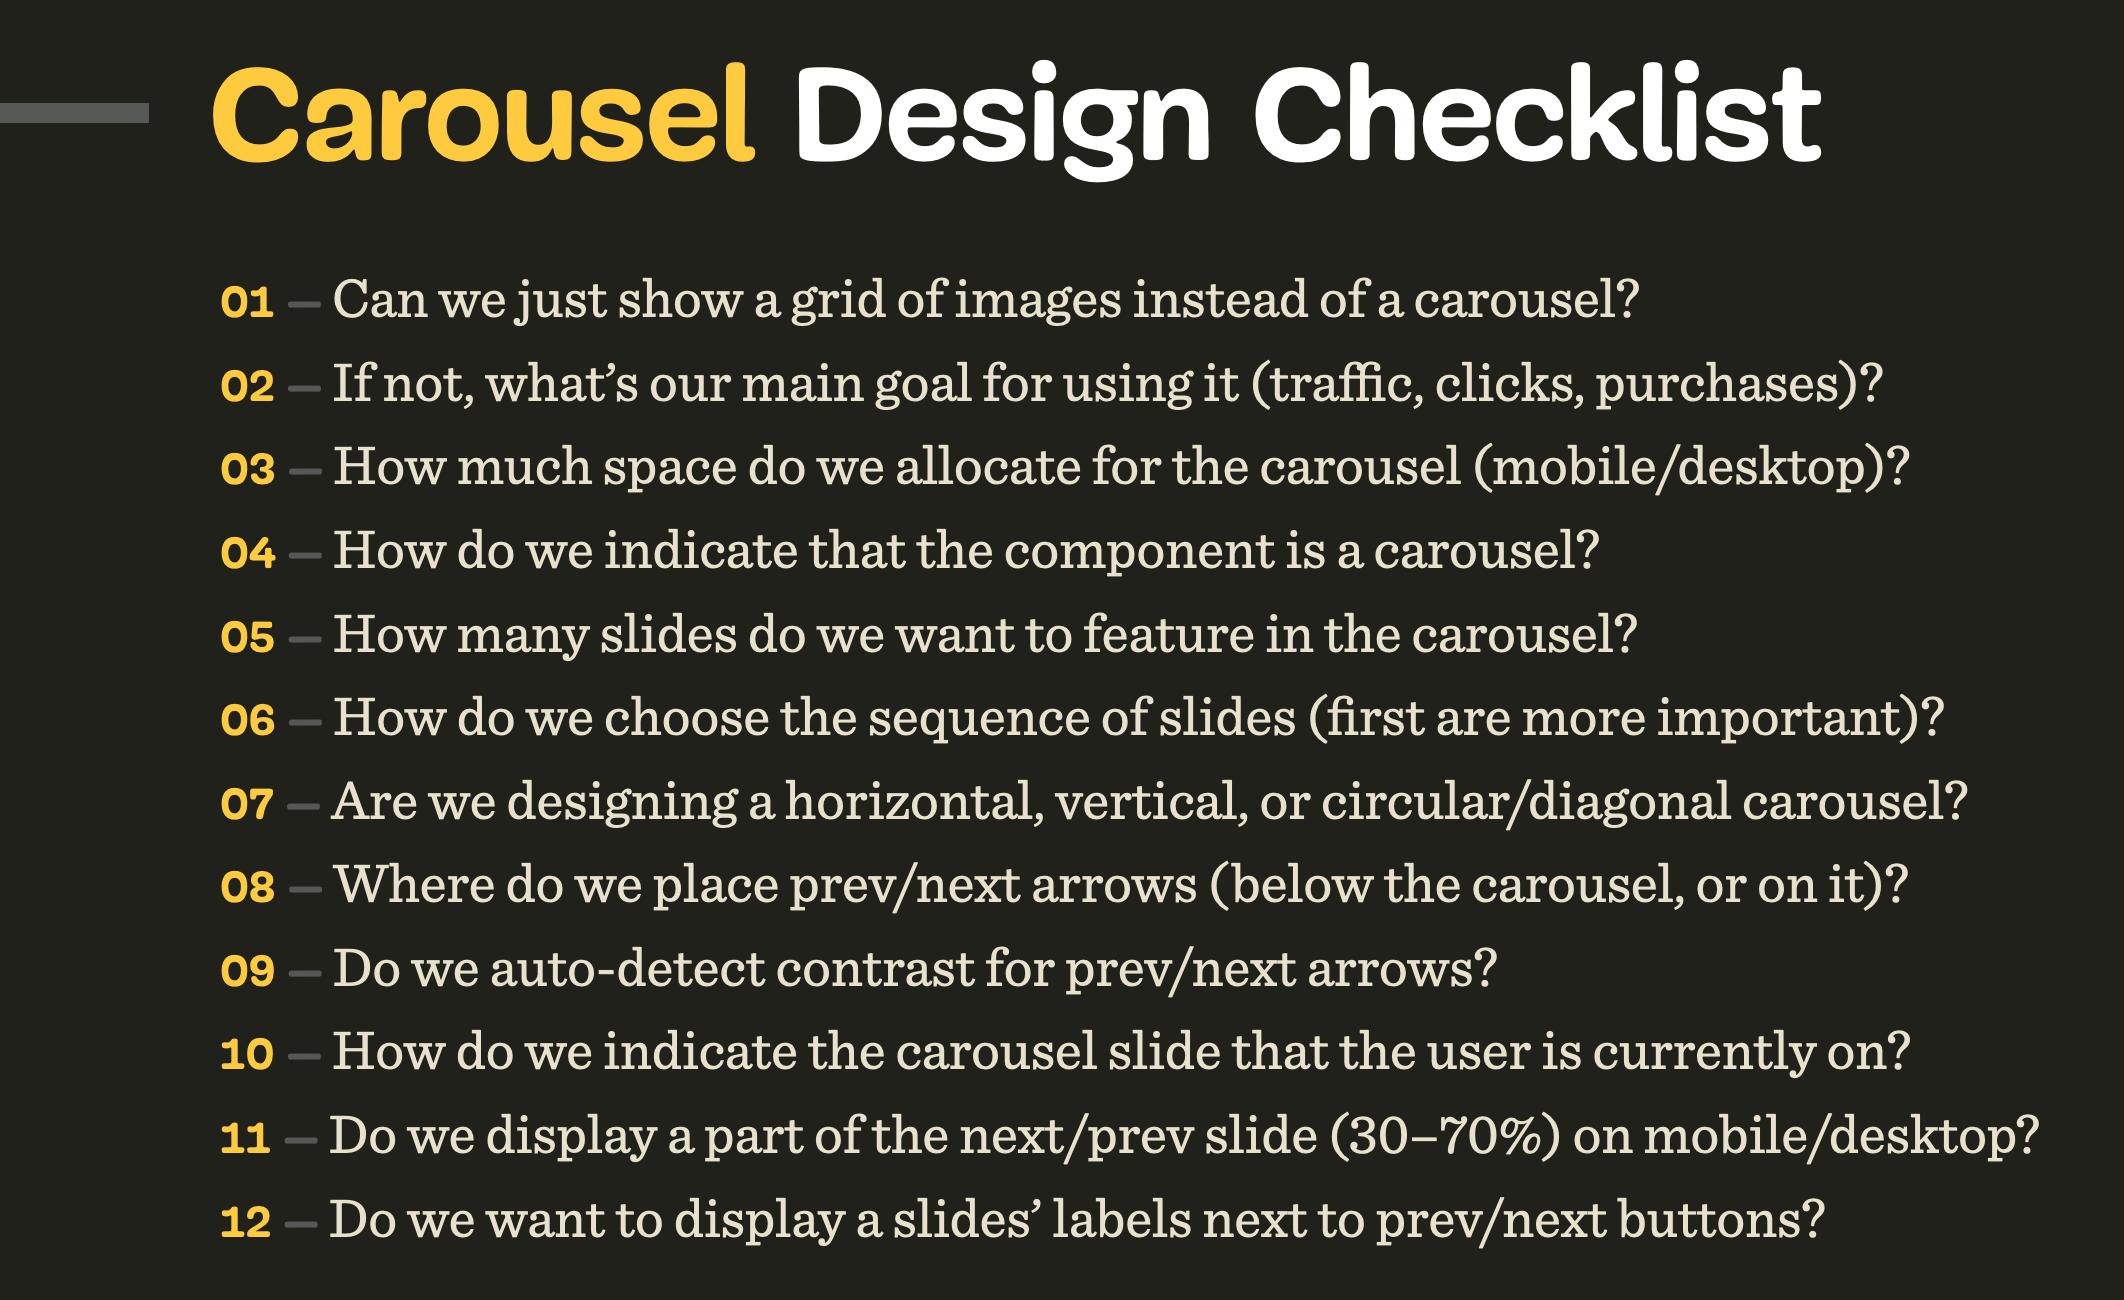 Carousel Design Checklist